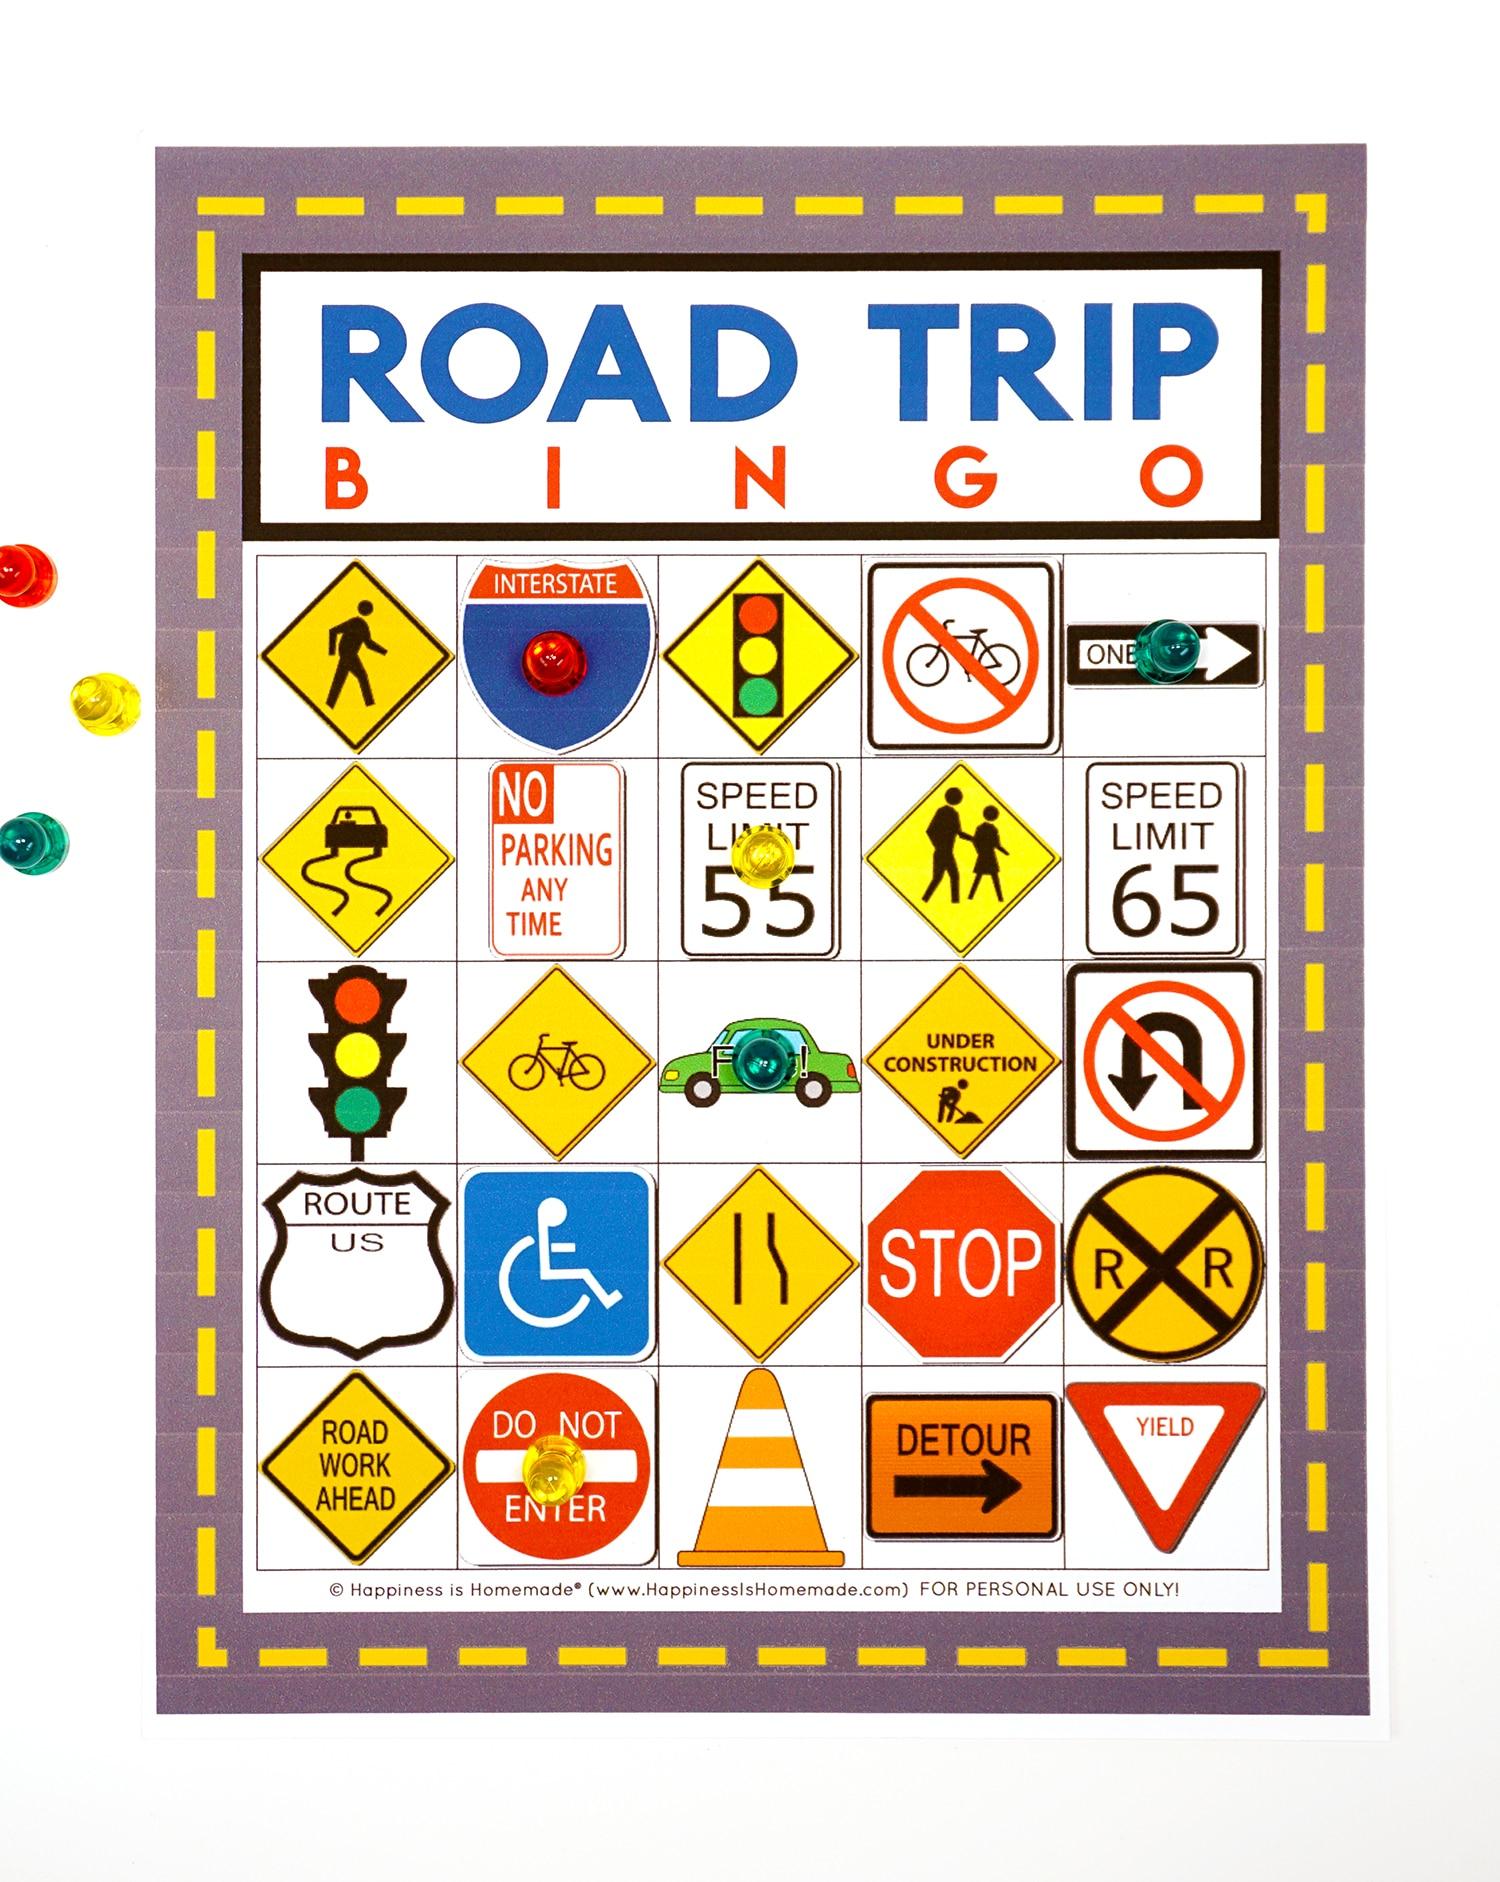 Road Trip Bingo Game - Free Printable - Happiness Is Homemade